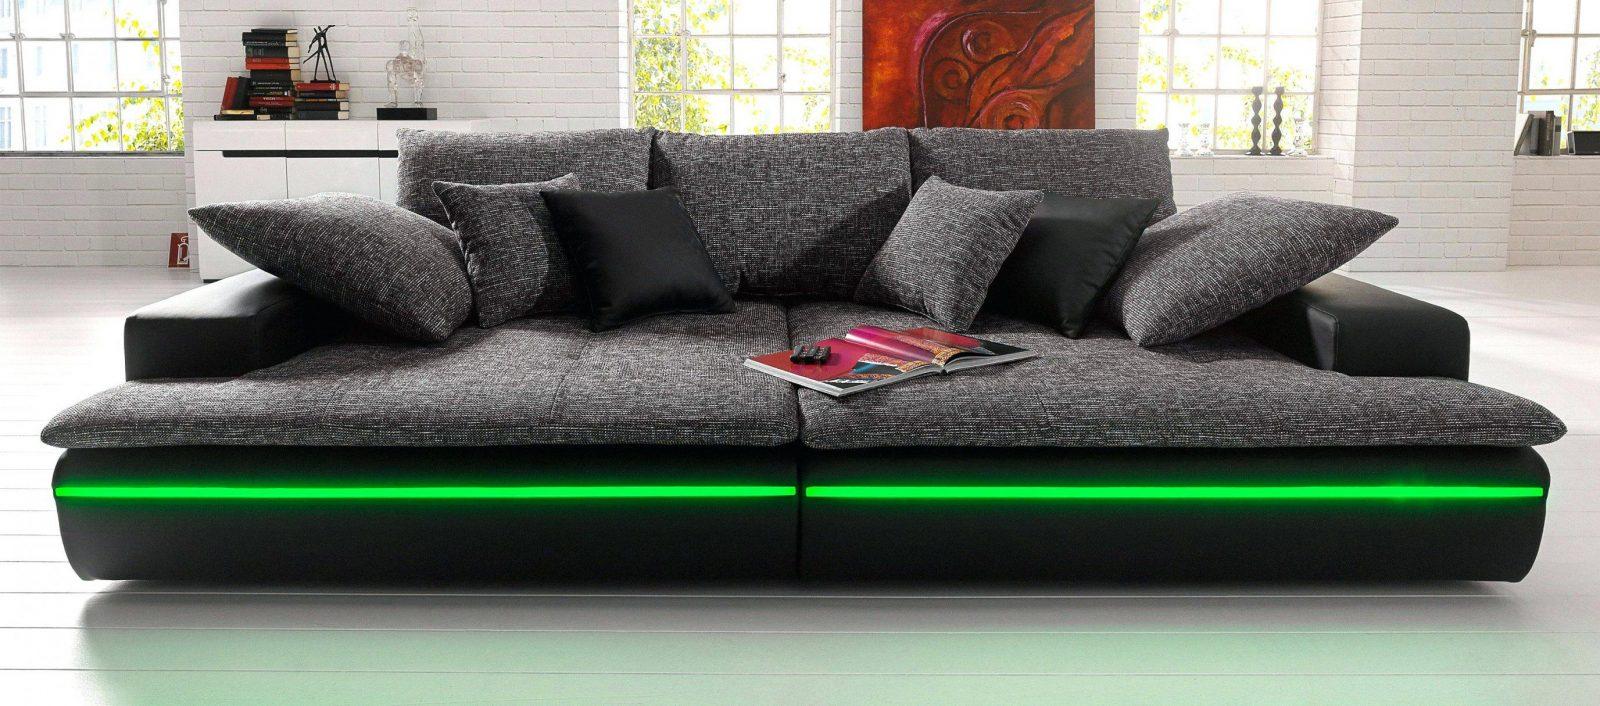 Xxl Big Sofa Big Sofa Designs For Drawing Room In Big Sofa Big Sofa von Big Sofa Xxl Lutz Bild